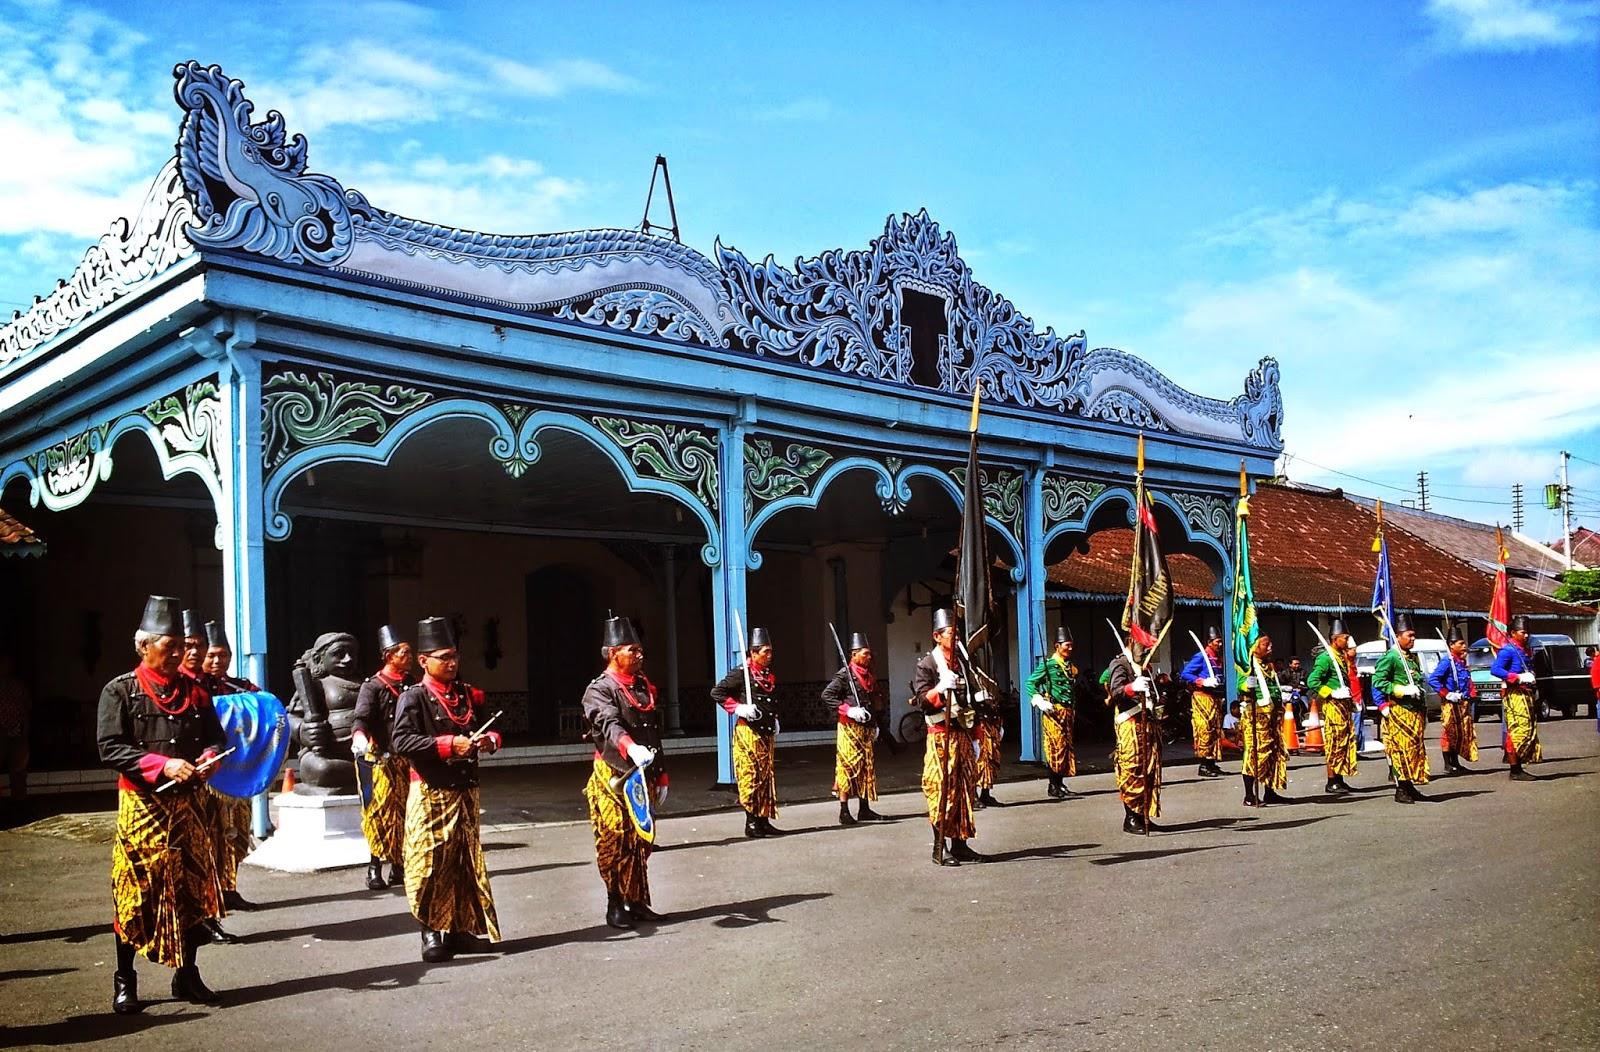 Info Wisata di Kota Solo: Berkeliling Mengenal Budaya Solo di Keraton Kasunanan Solo